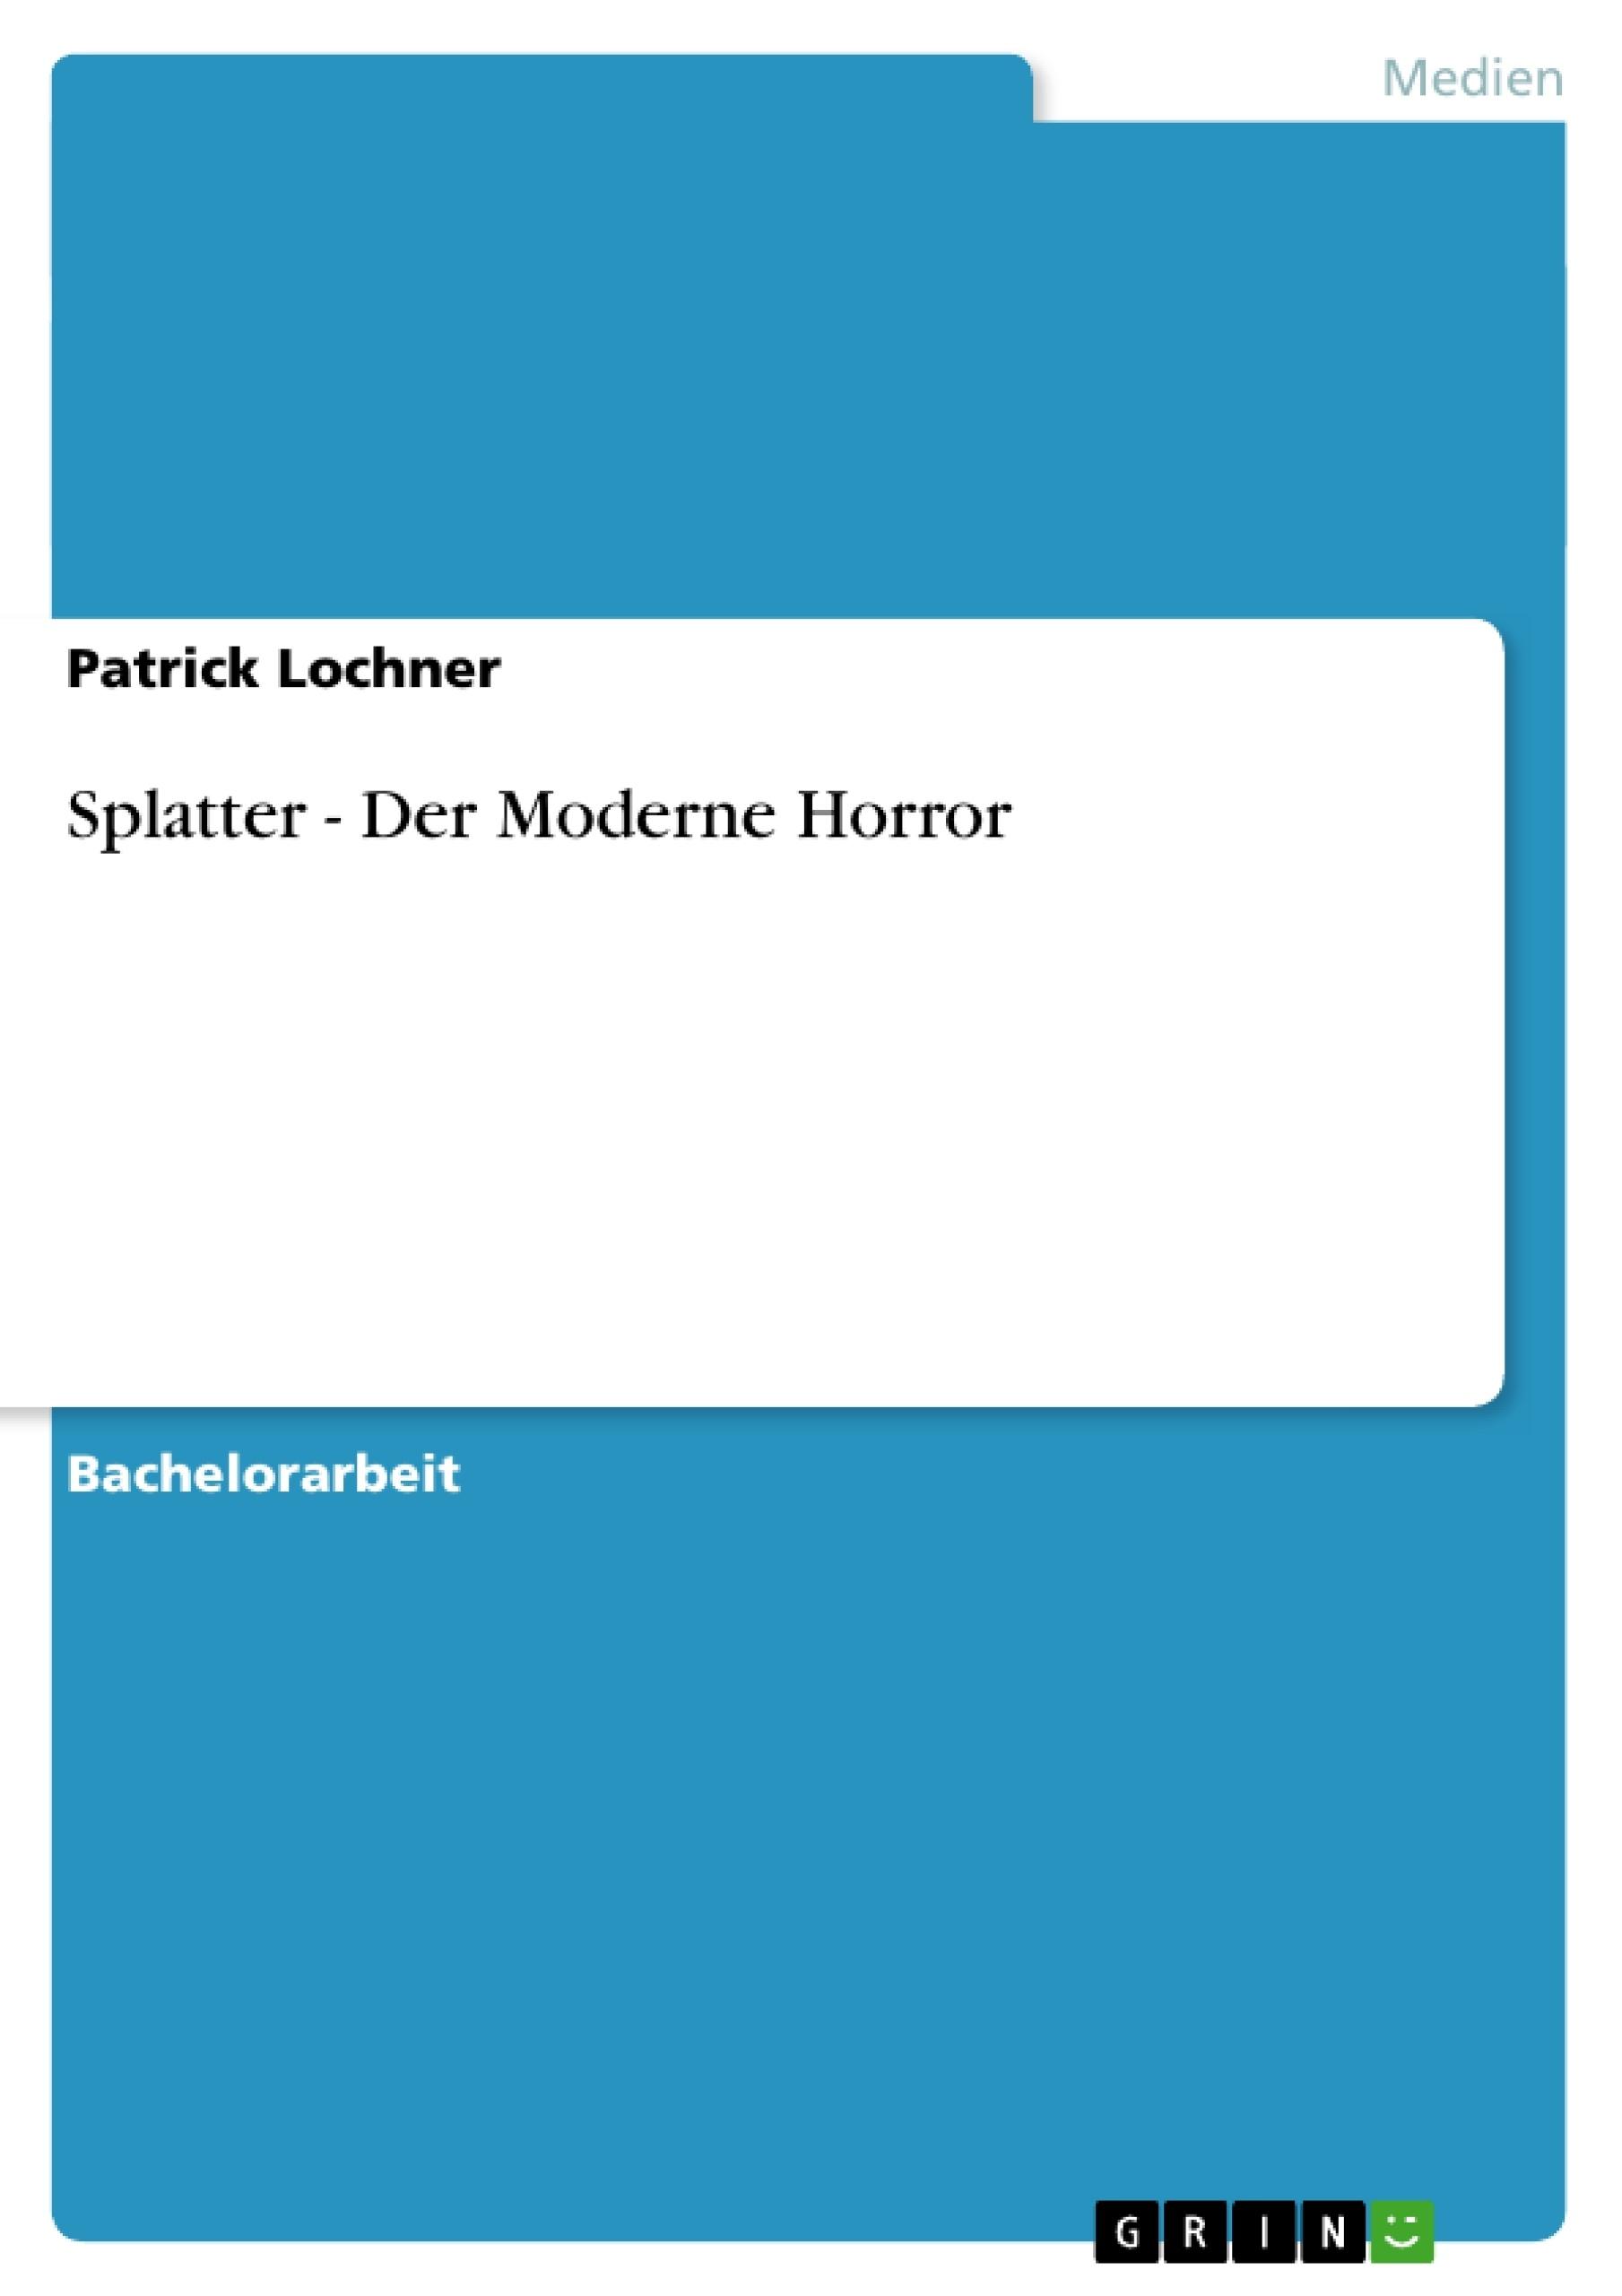 Titel: Splatter - Der Moderne Horror